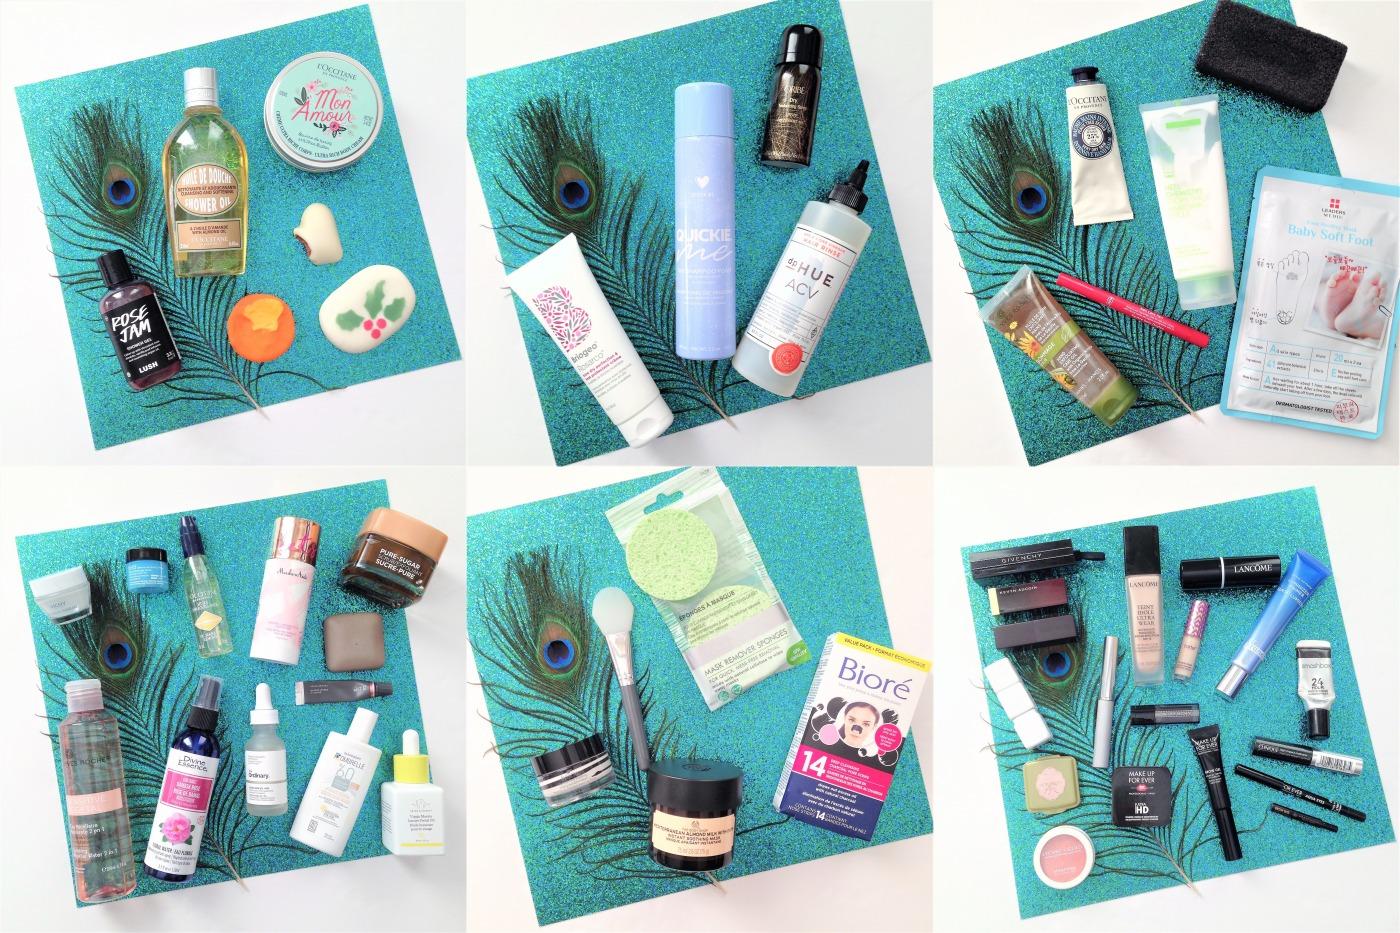 current favorite skincare, makeup, body care